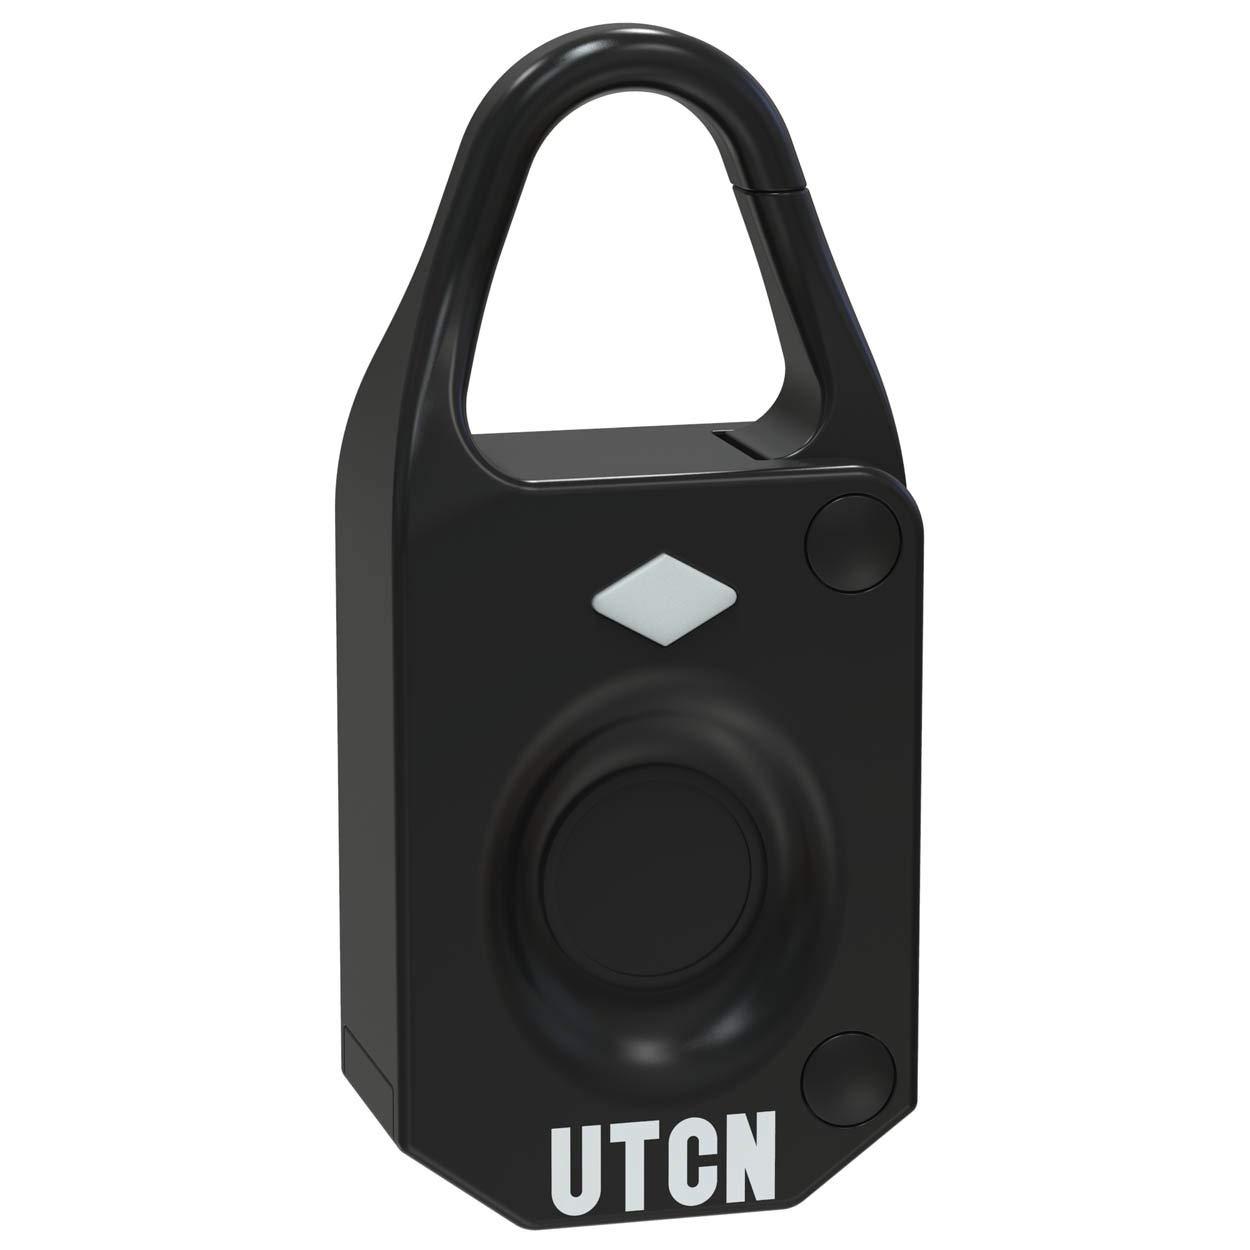 fb13a5612 UTech Mini Candado Huella Dactilar, Candado Maleta, Bloqueo Biométrico, sin  necesidad de Llaves